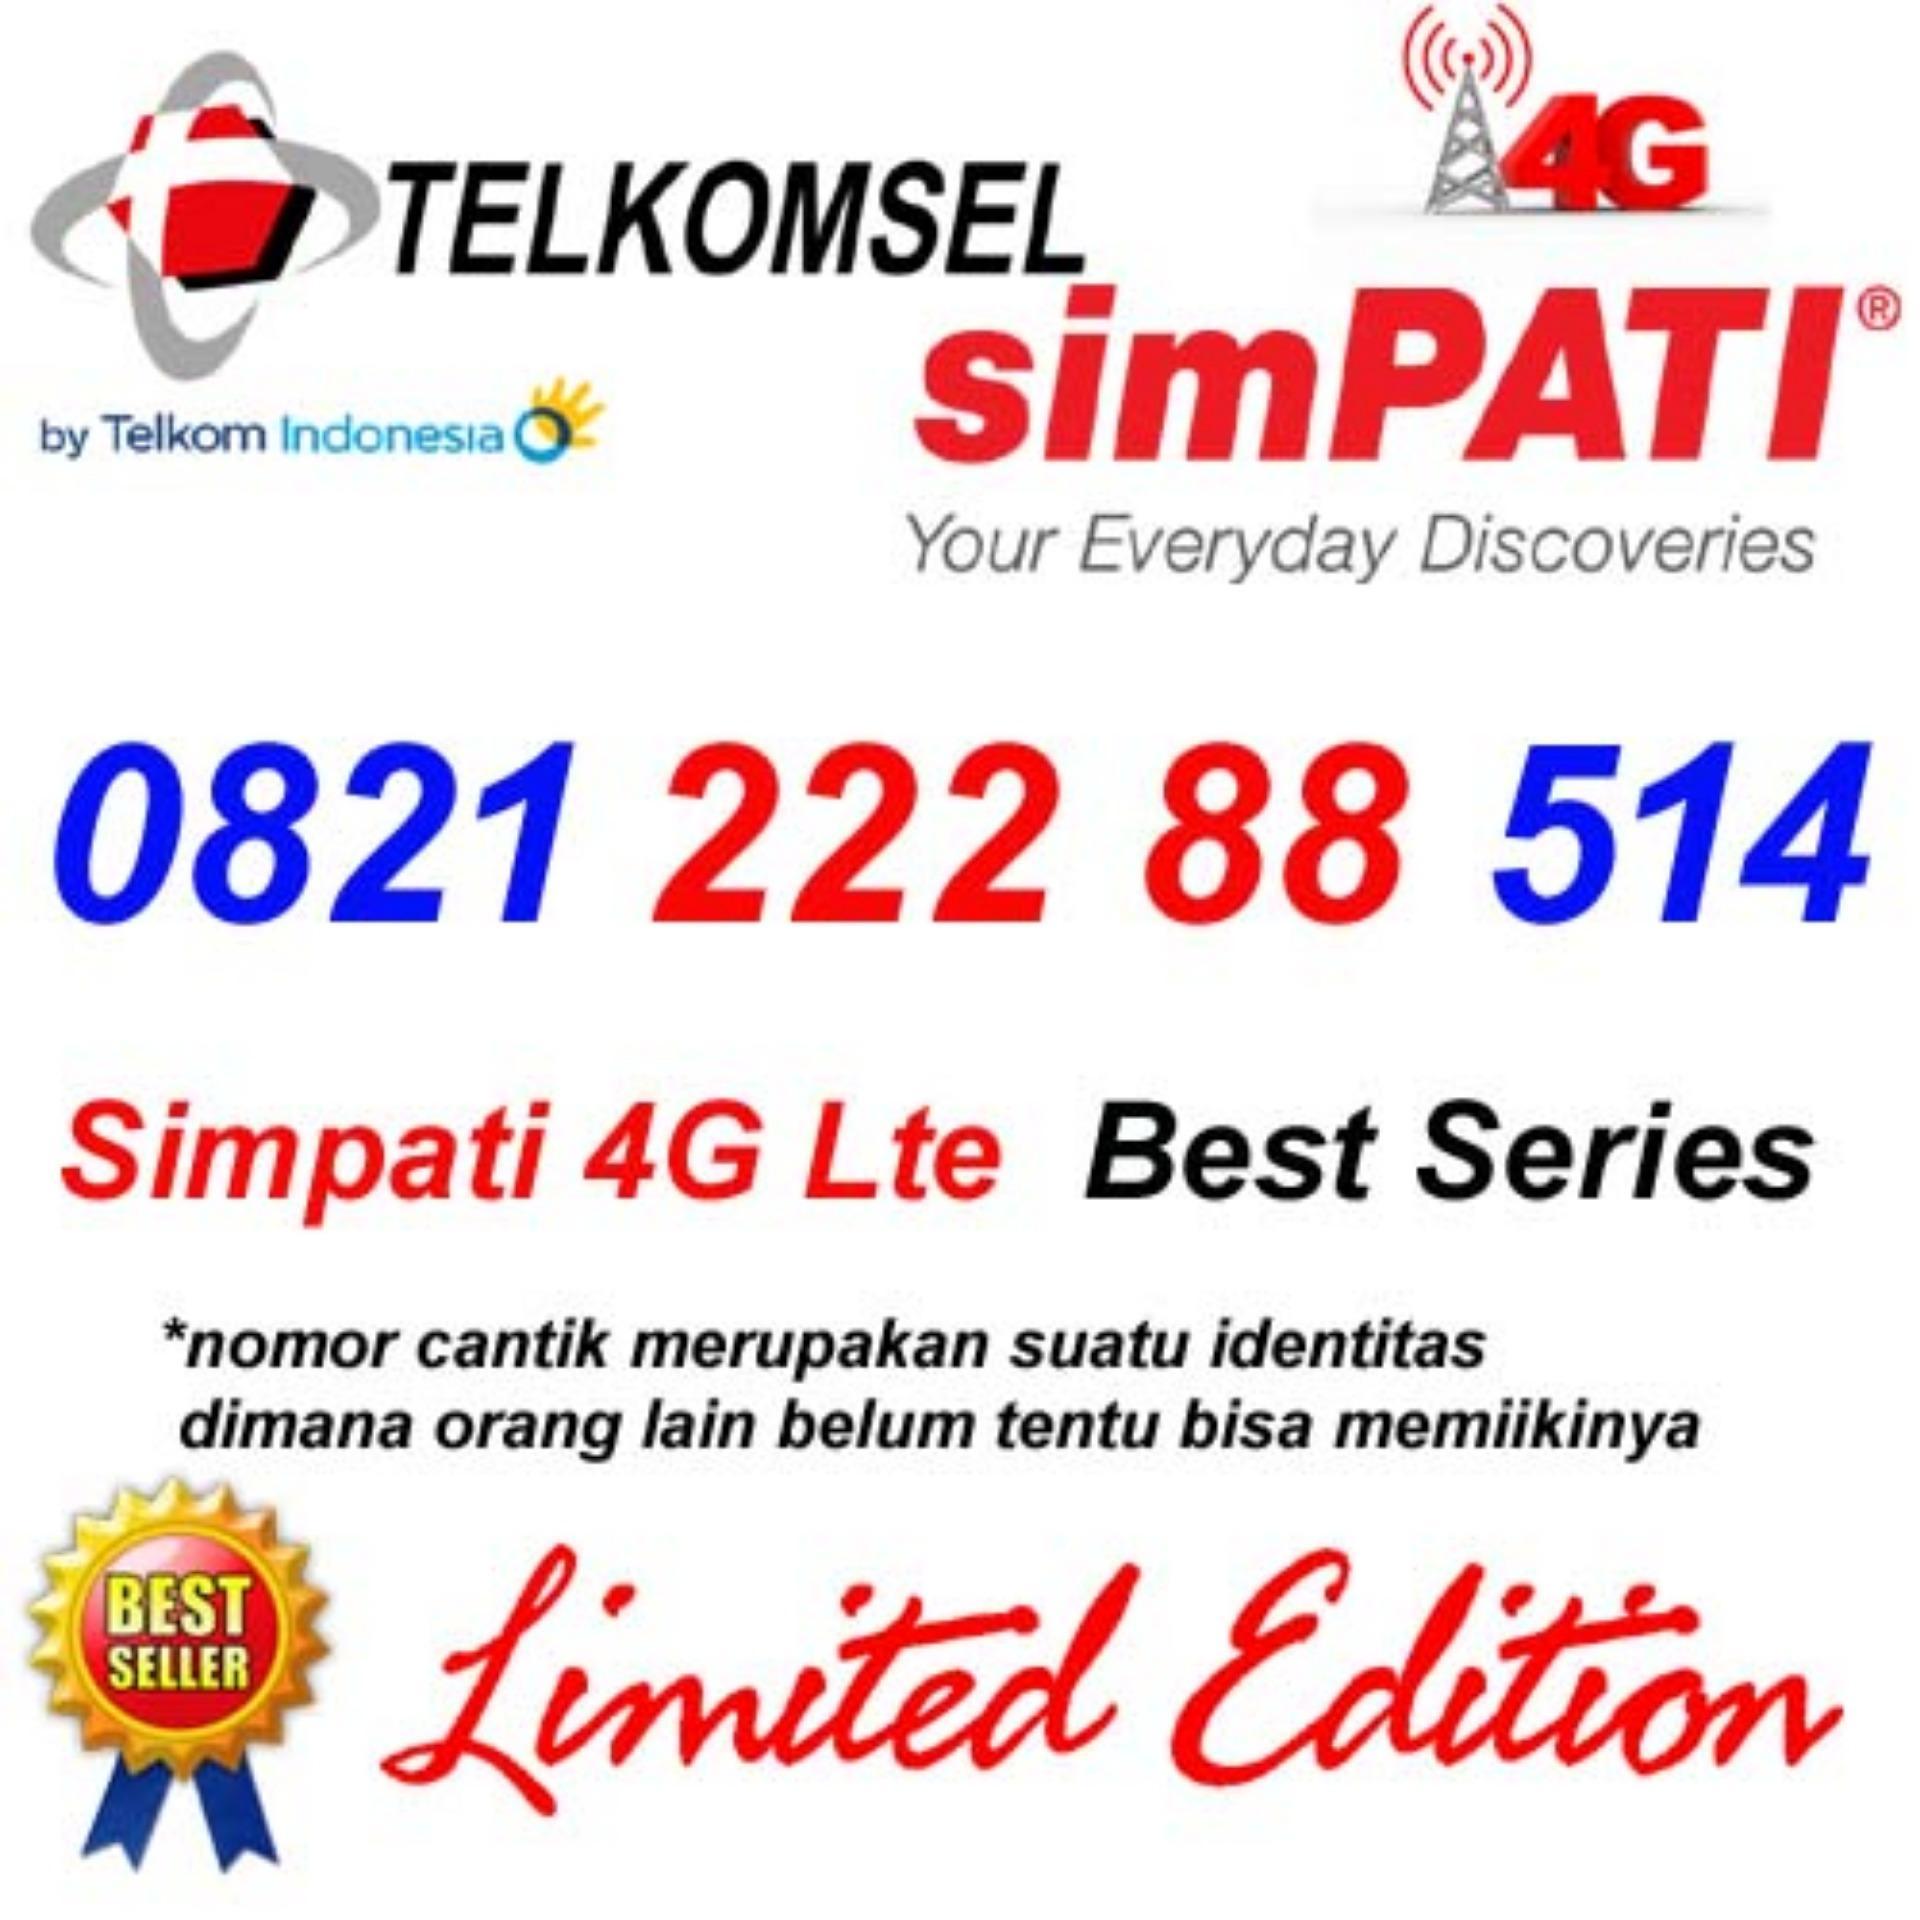 Telkomsel Simpati 4G Lte 0821 222 88 514 Kartu Perdana Nomor cantik